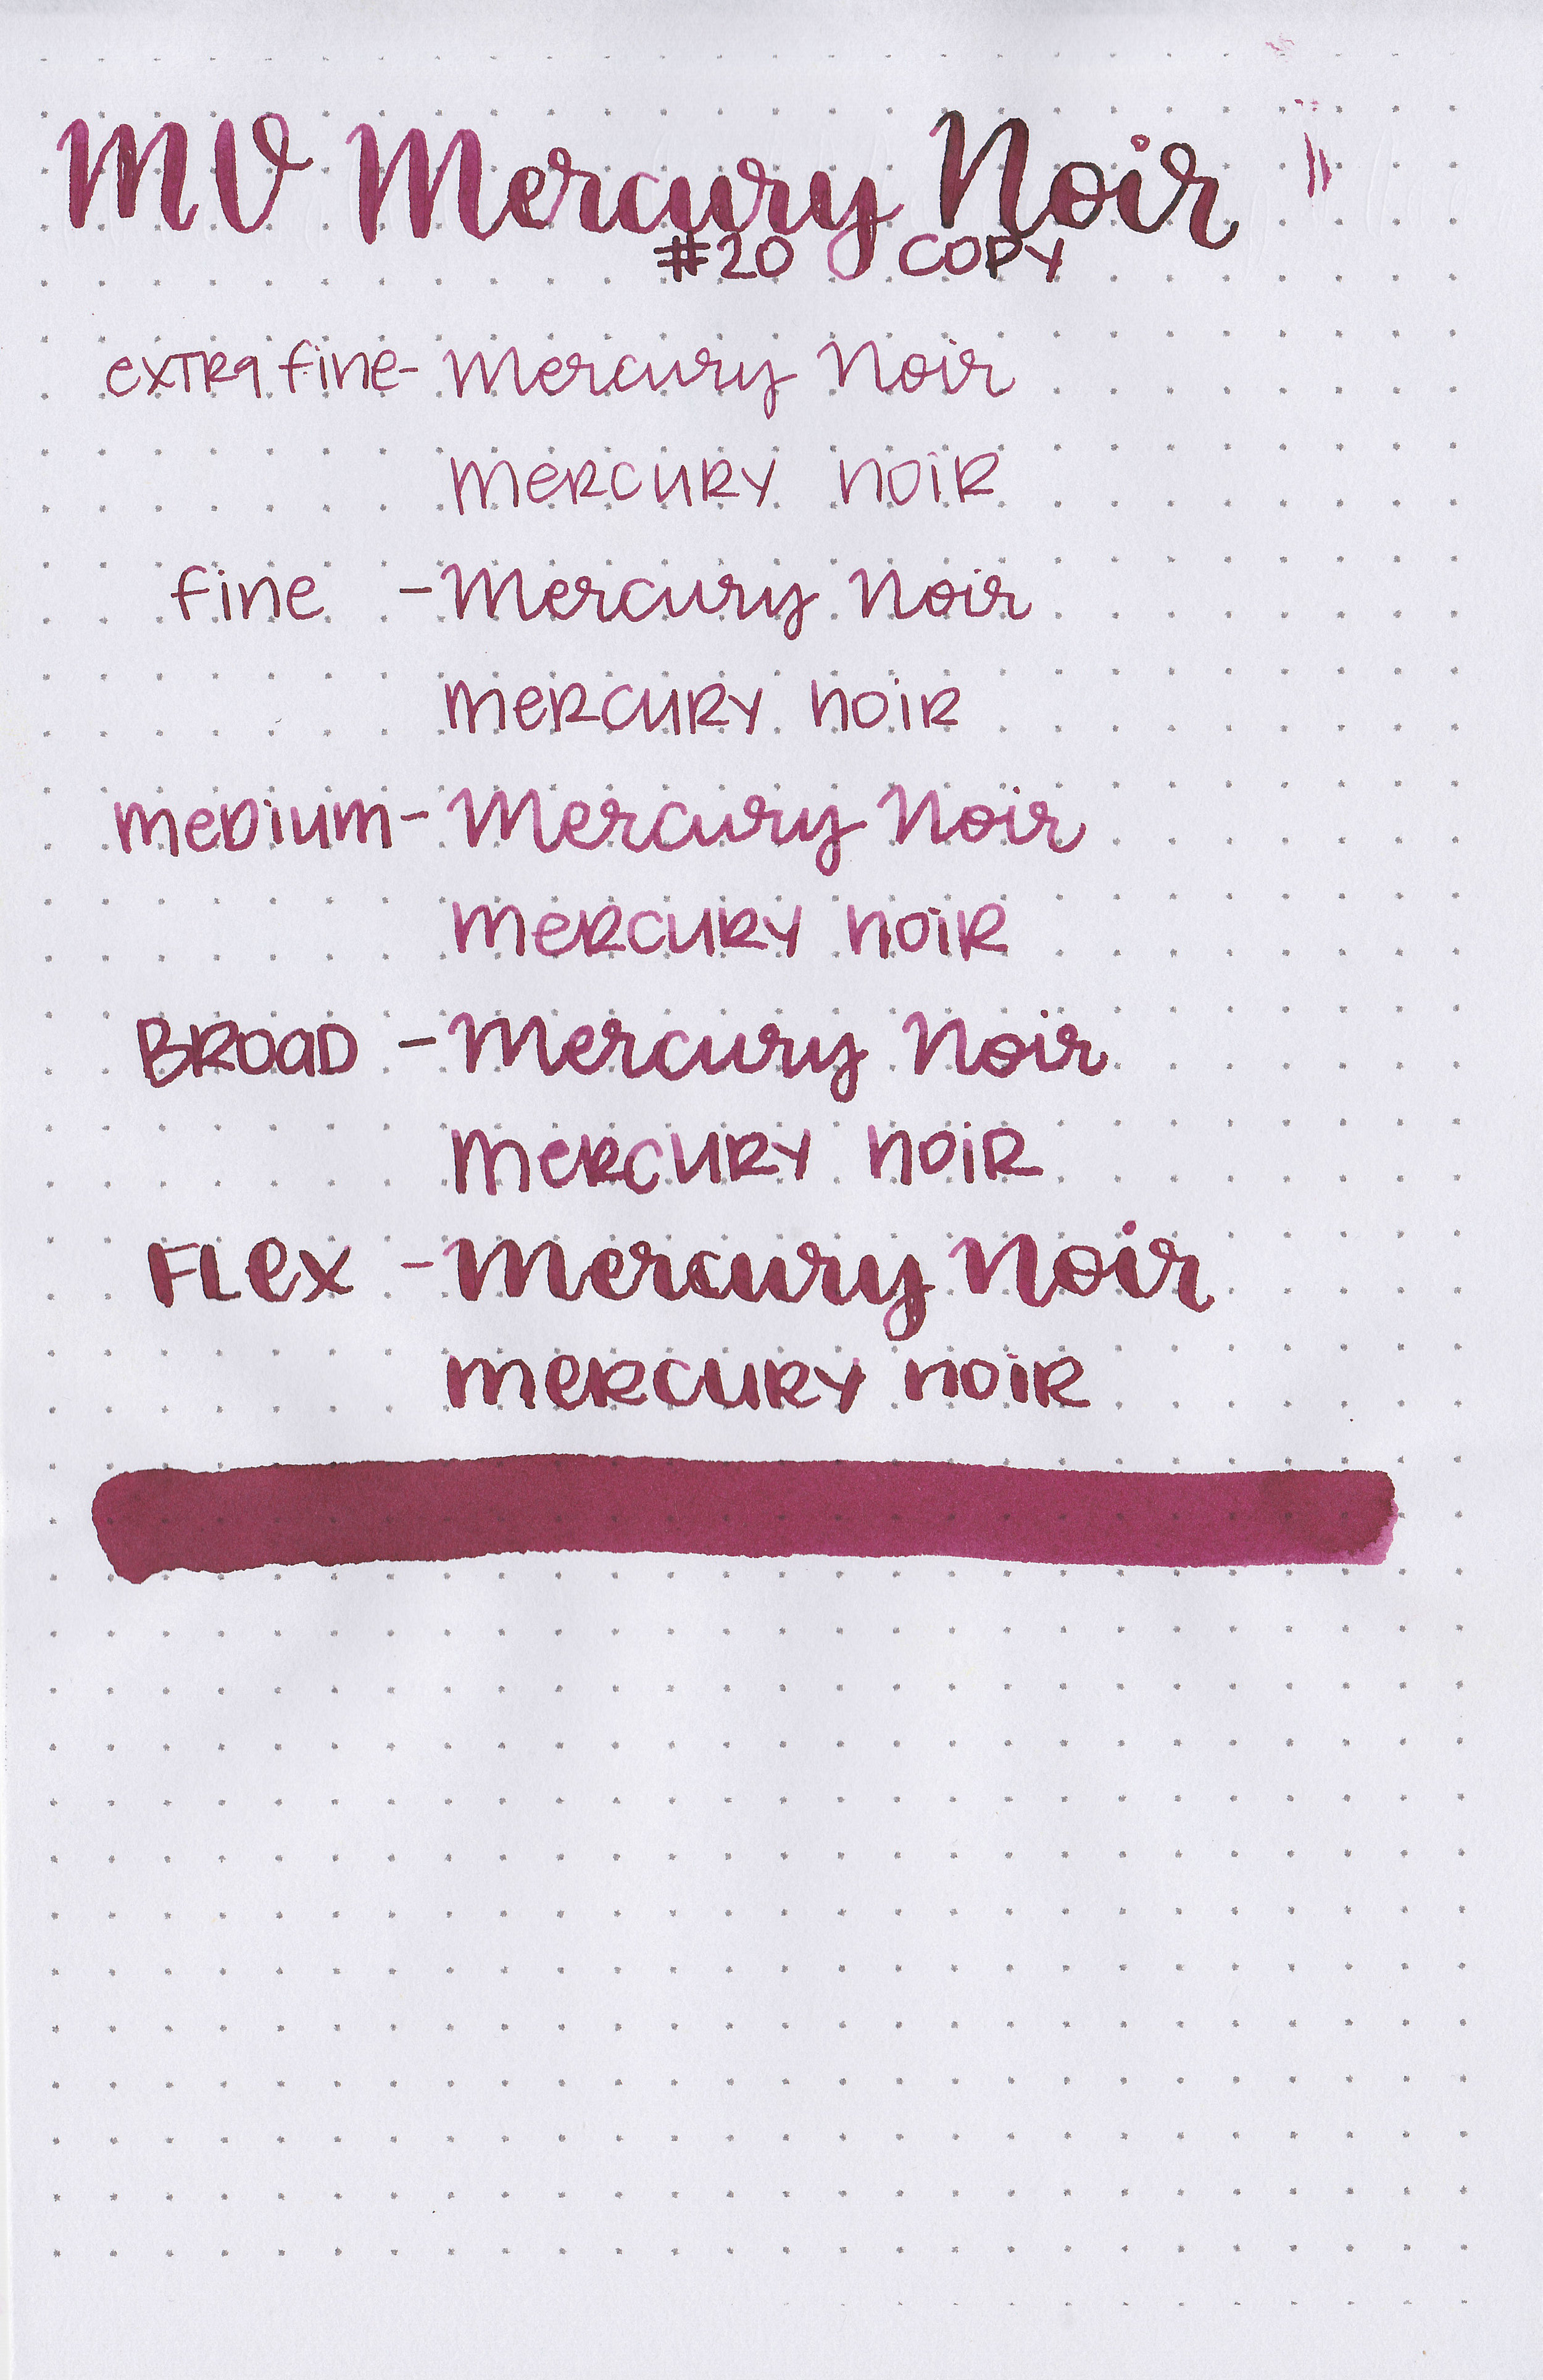 mv-mercury-noir-11.jpg